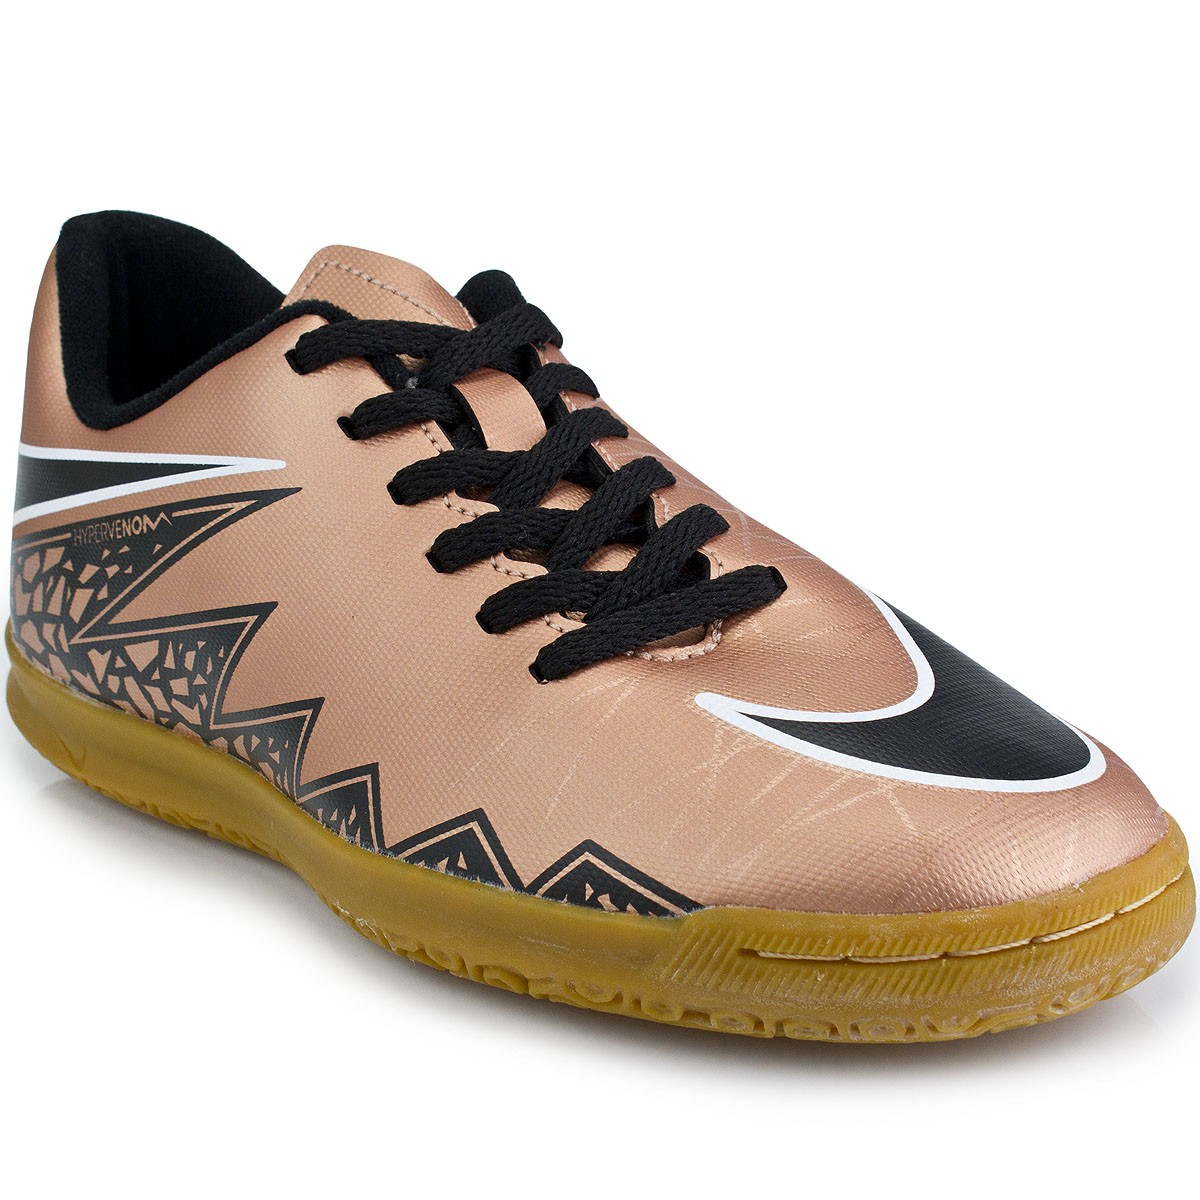 7c57825085 Chuteira Nike Hypervenom Phade II IC Jr 749911